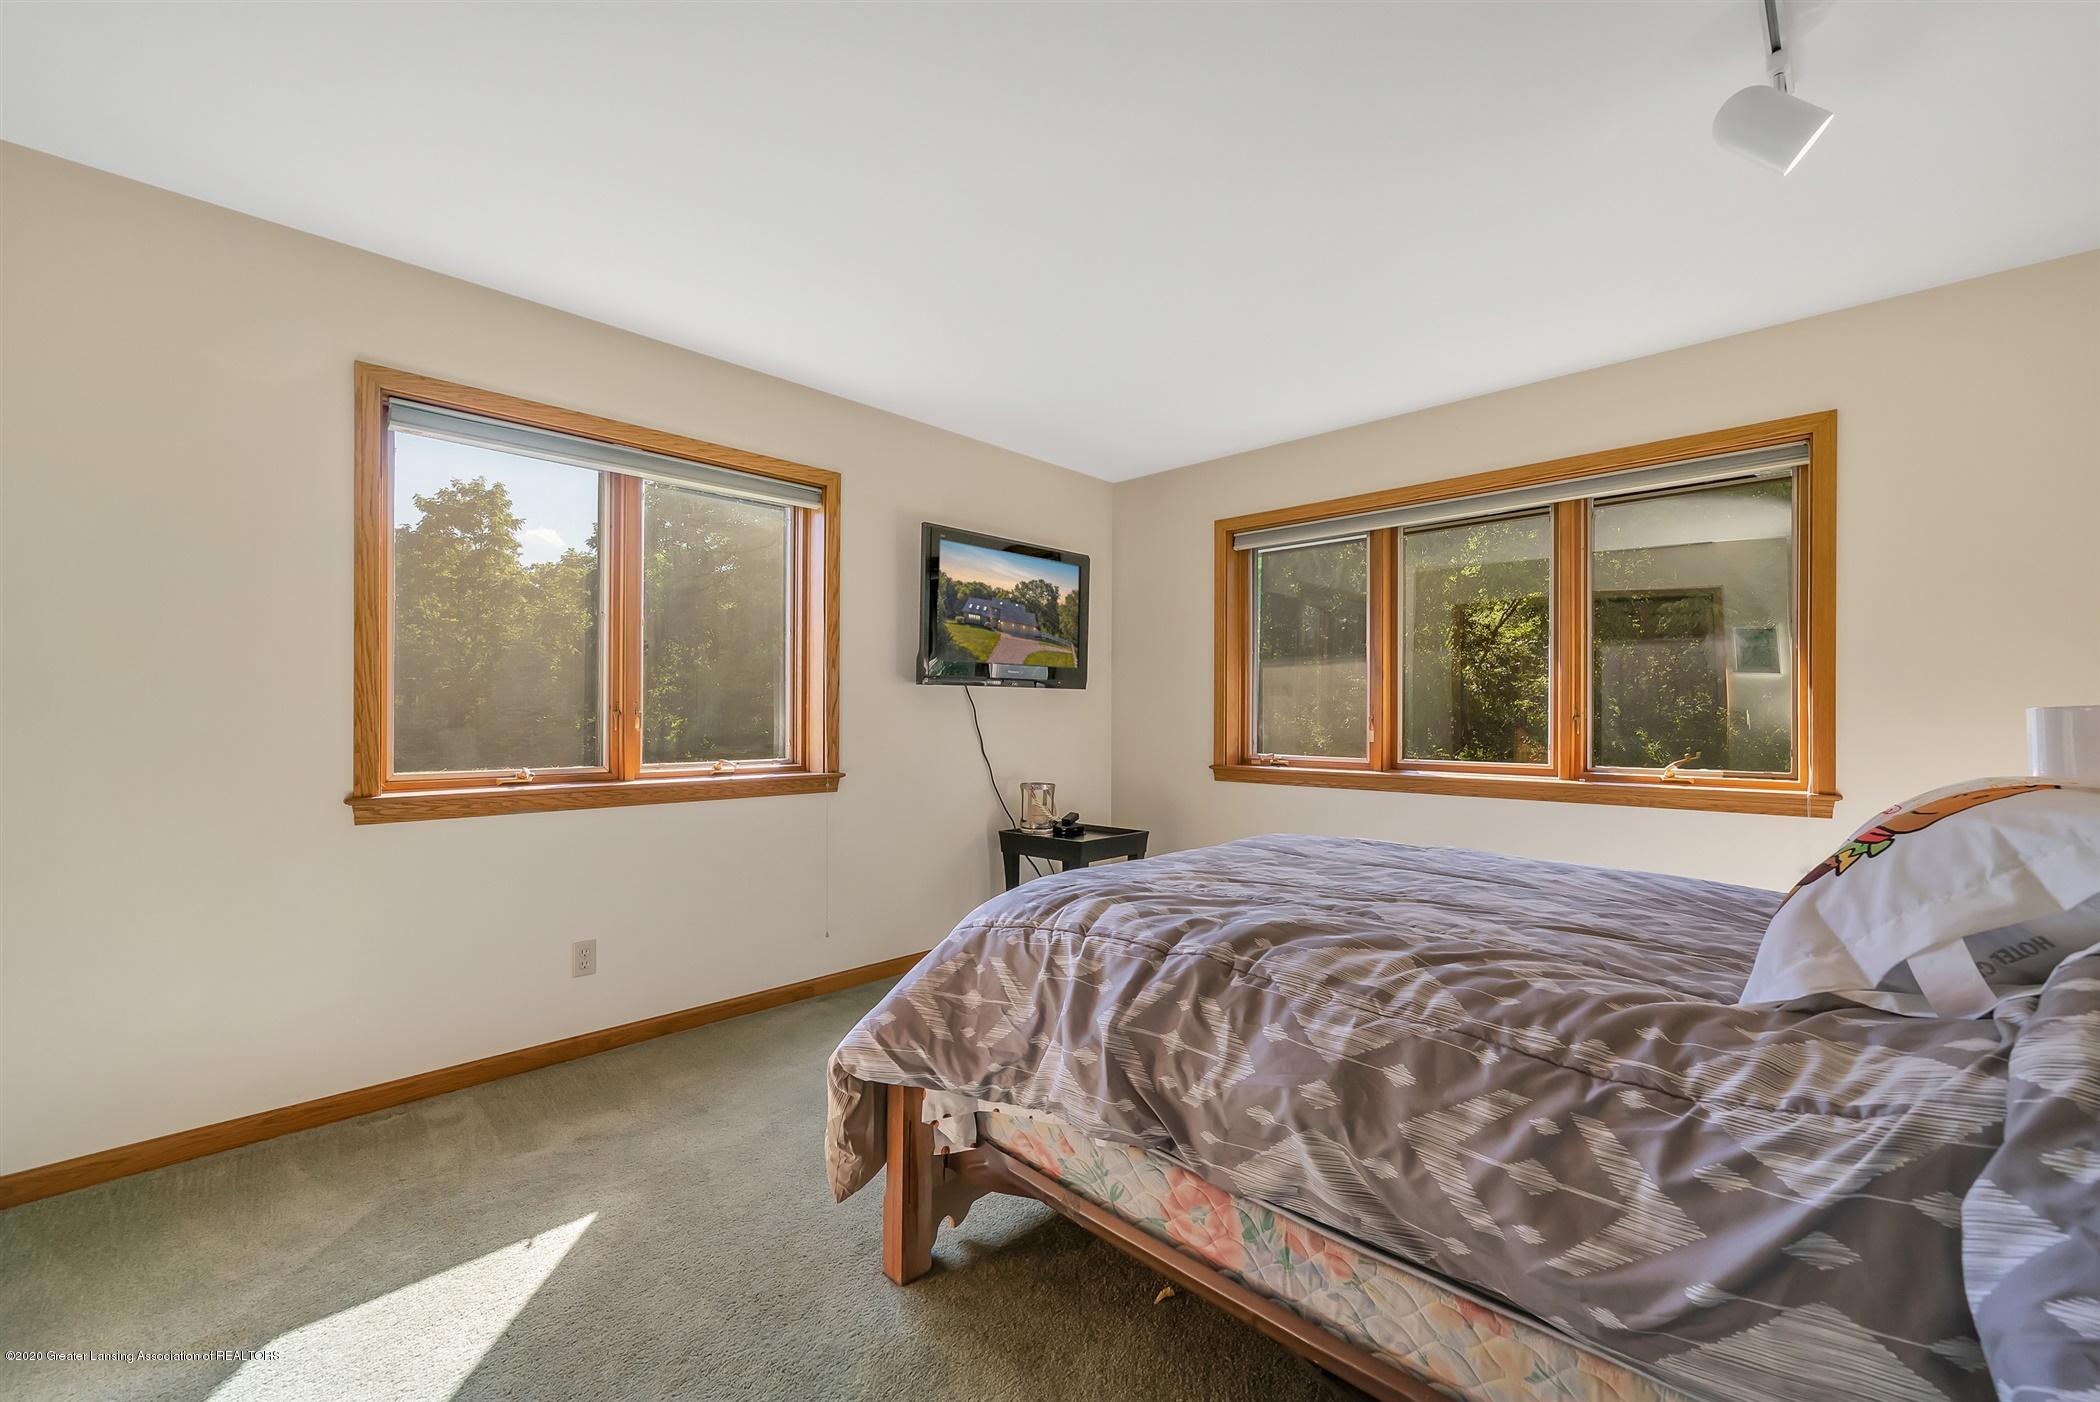 2275 Bravender Rd - SECOND FLOOR Bedroom 4 - 30